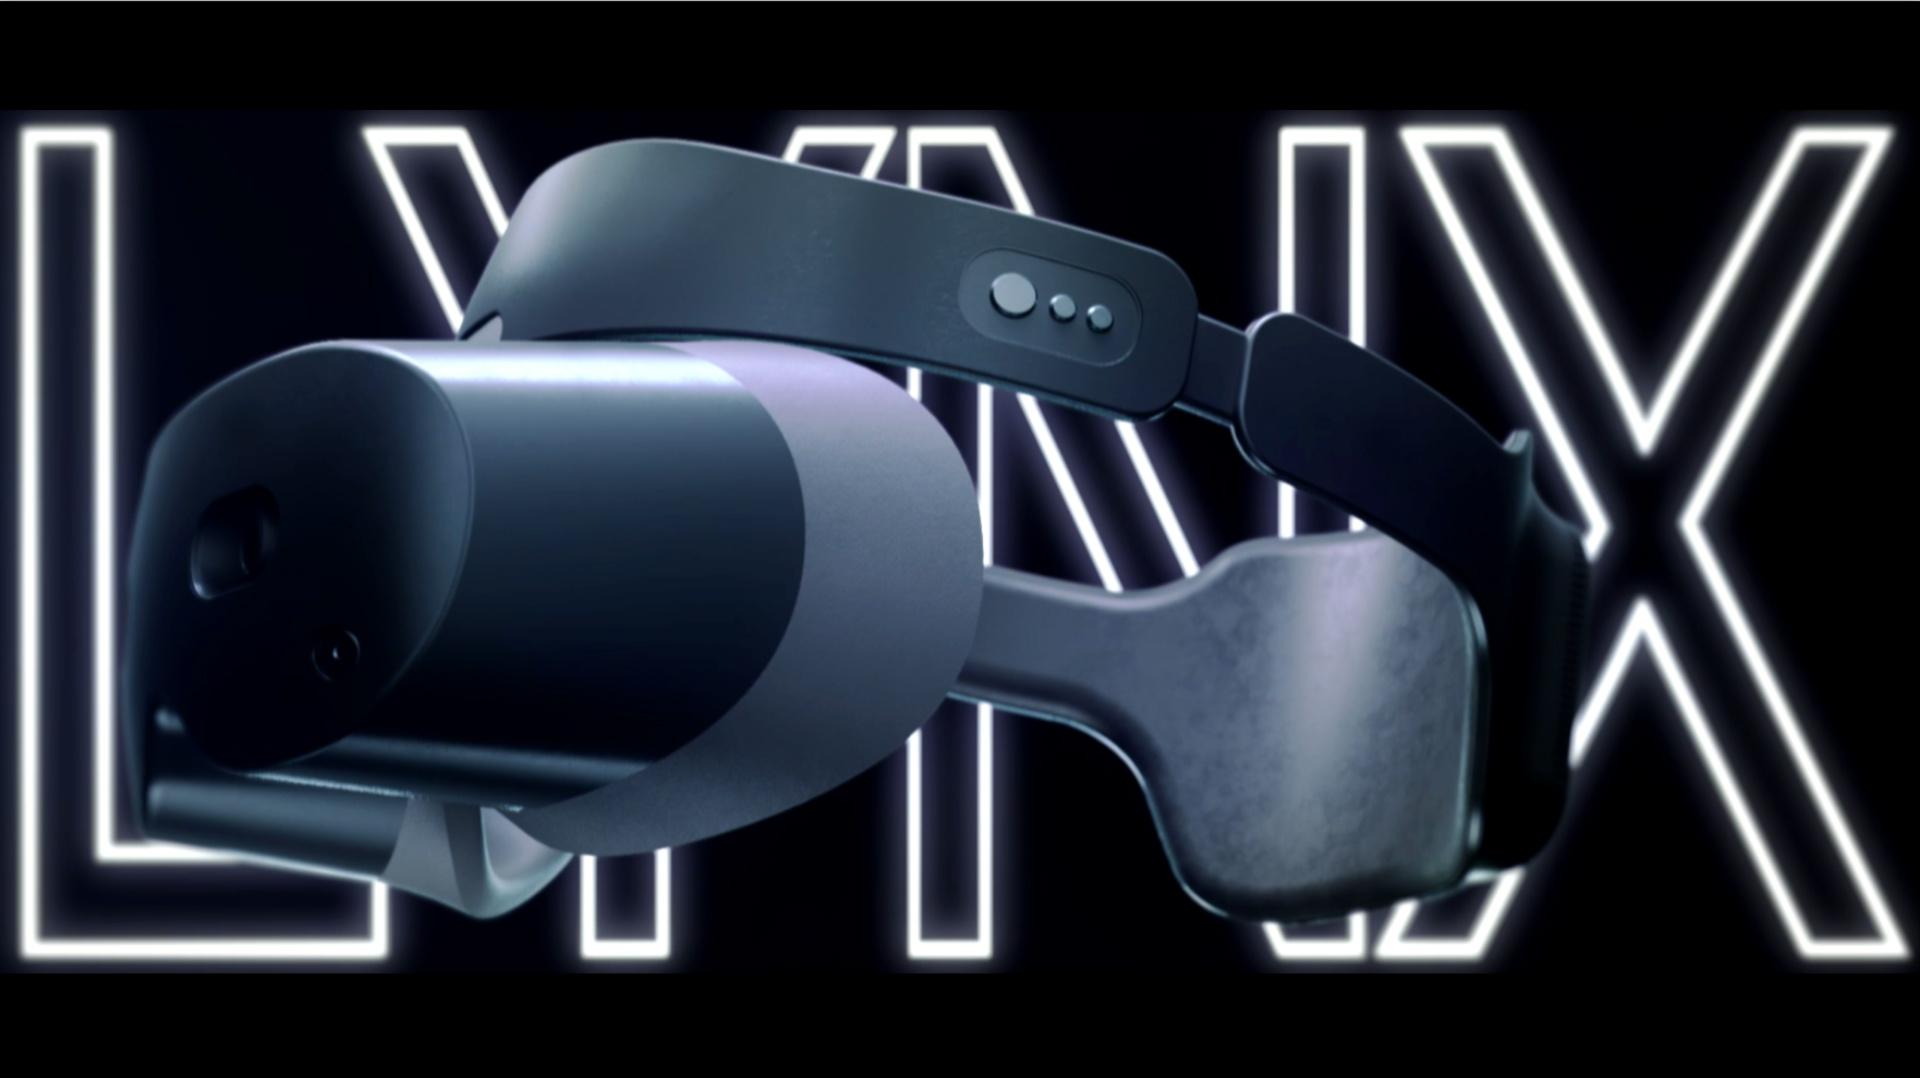 LYNX发布MR一体机R-1,售价1500美元,采用高通XR2以及新型透镜设计